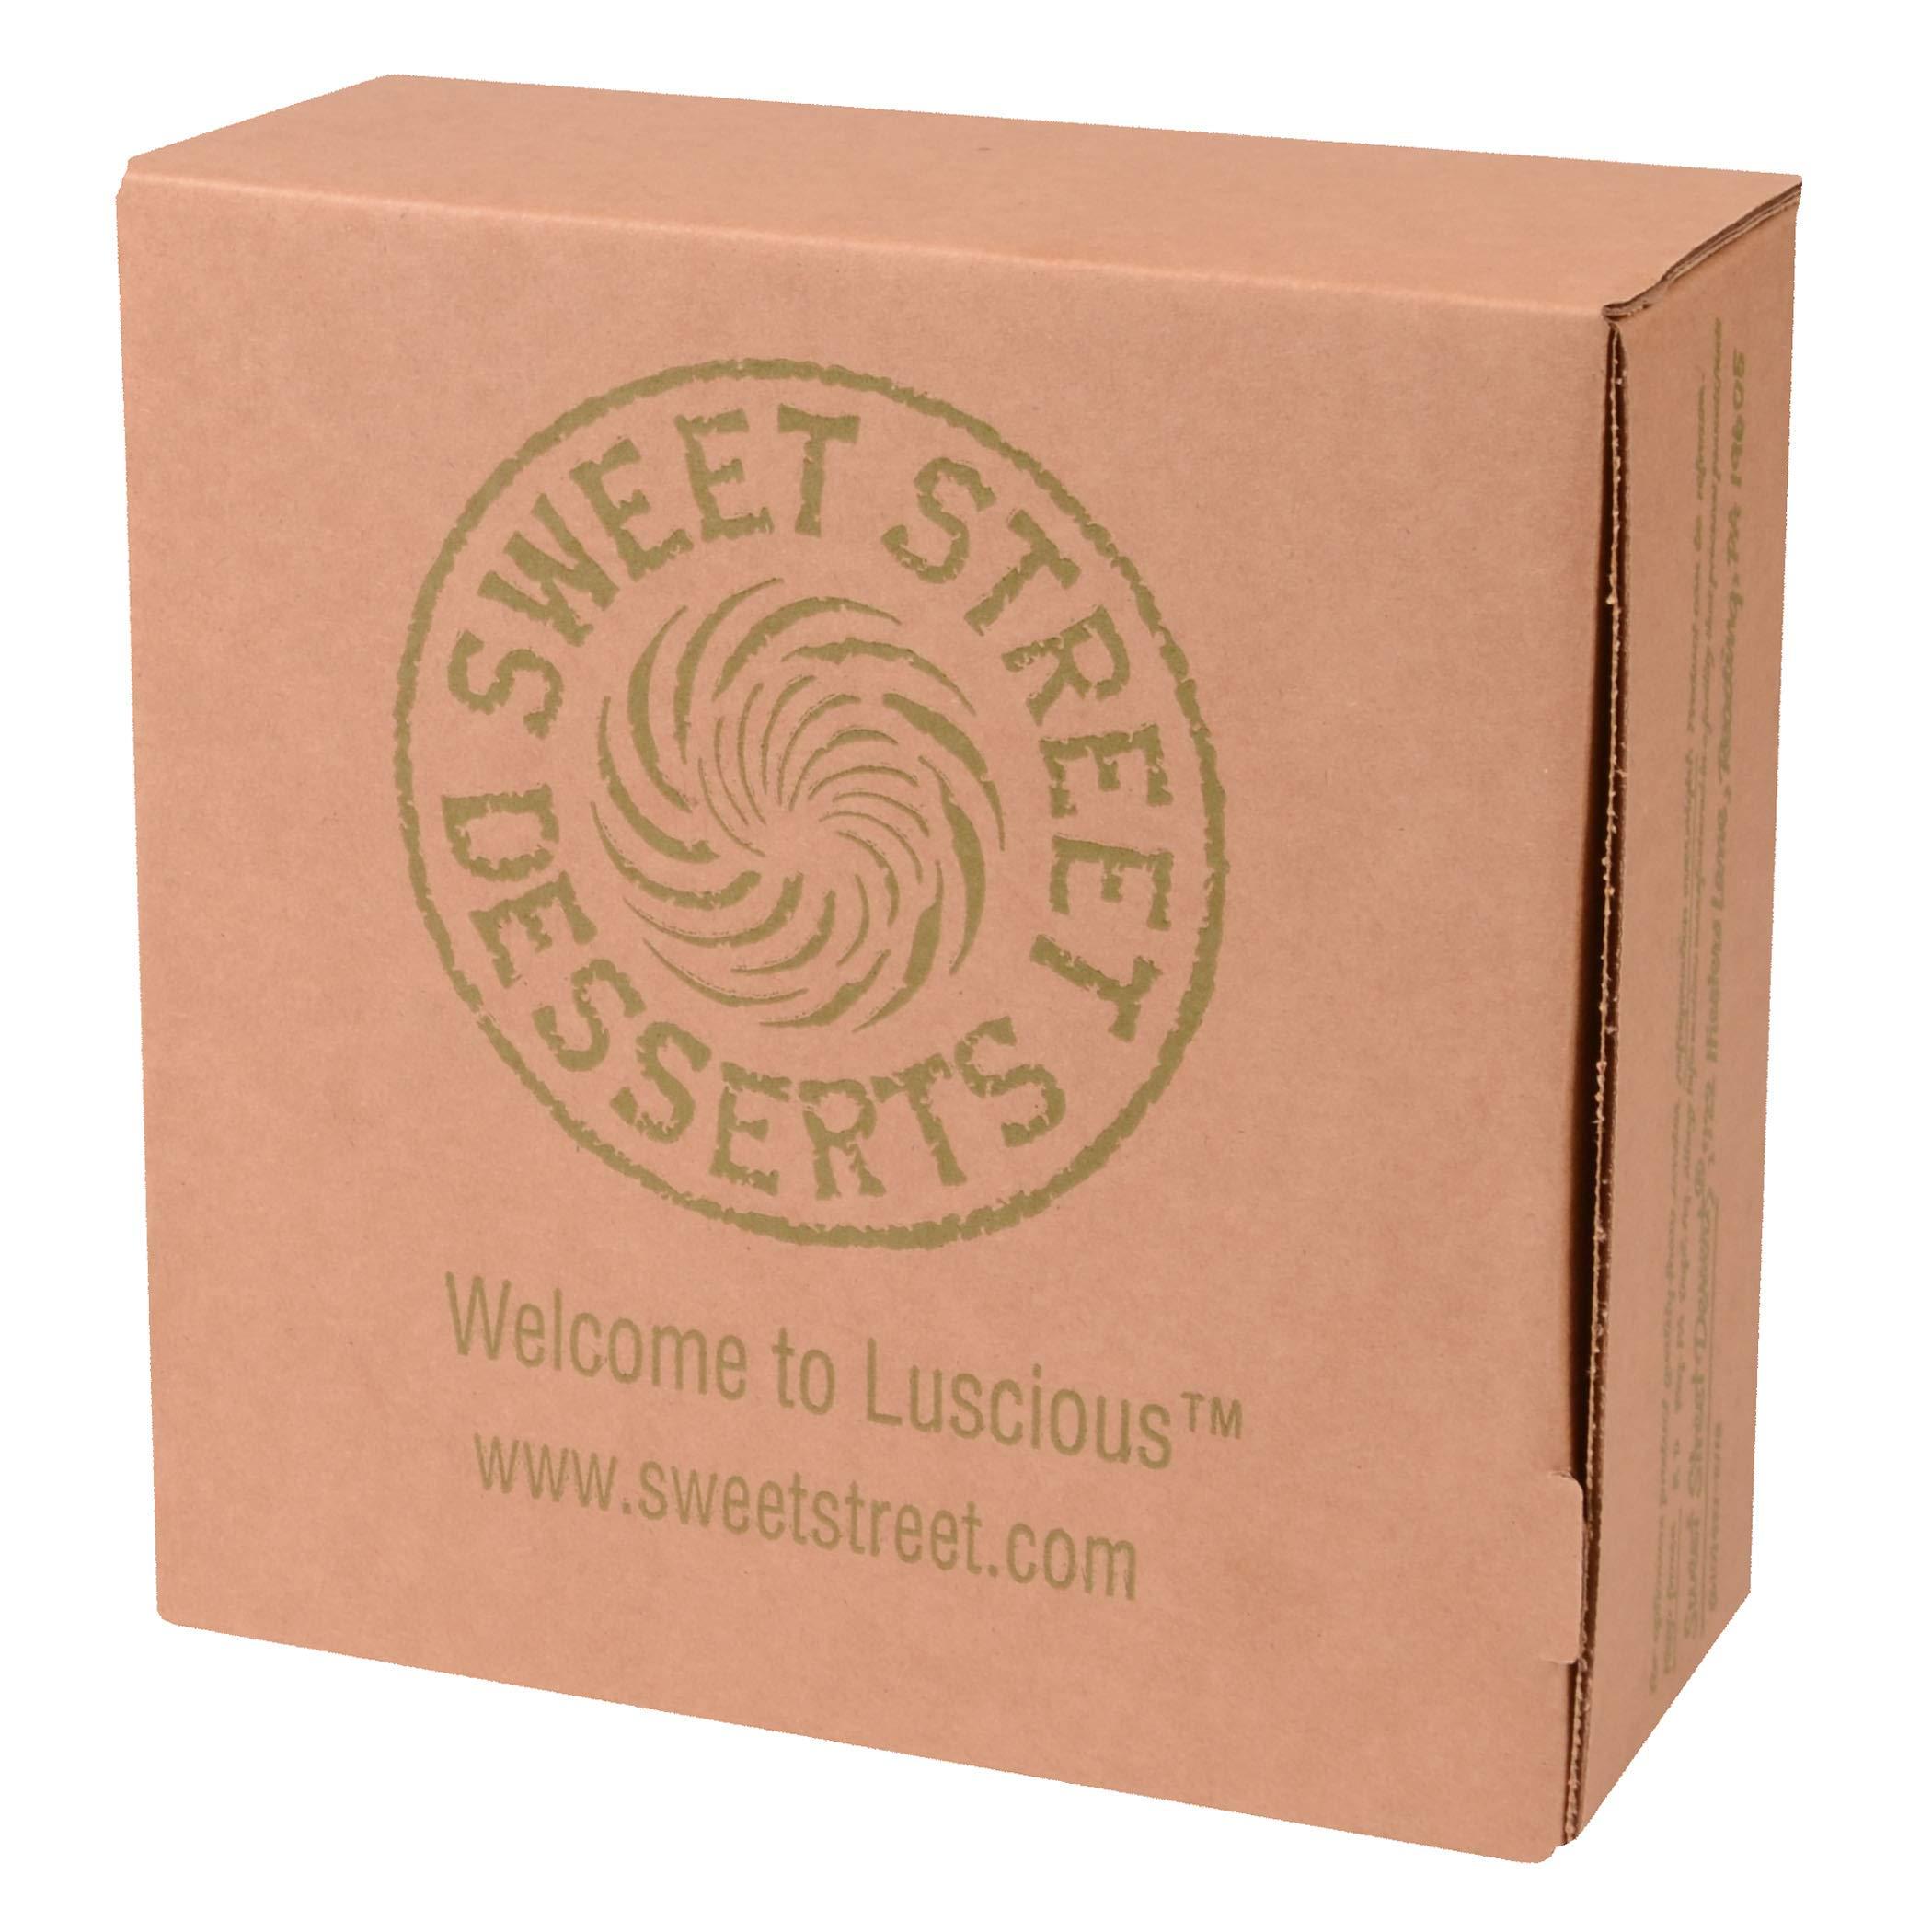 Sweet Street Gluten Free Nutella Iced Chocolate Nut Torta 3.125 lb (14 Slice) Pack of 2